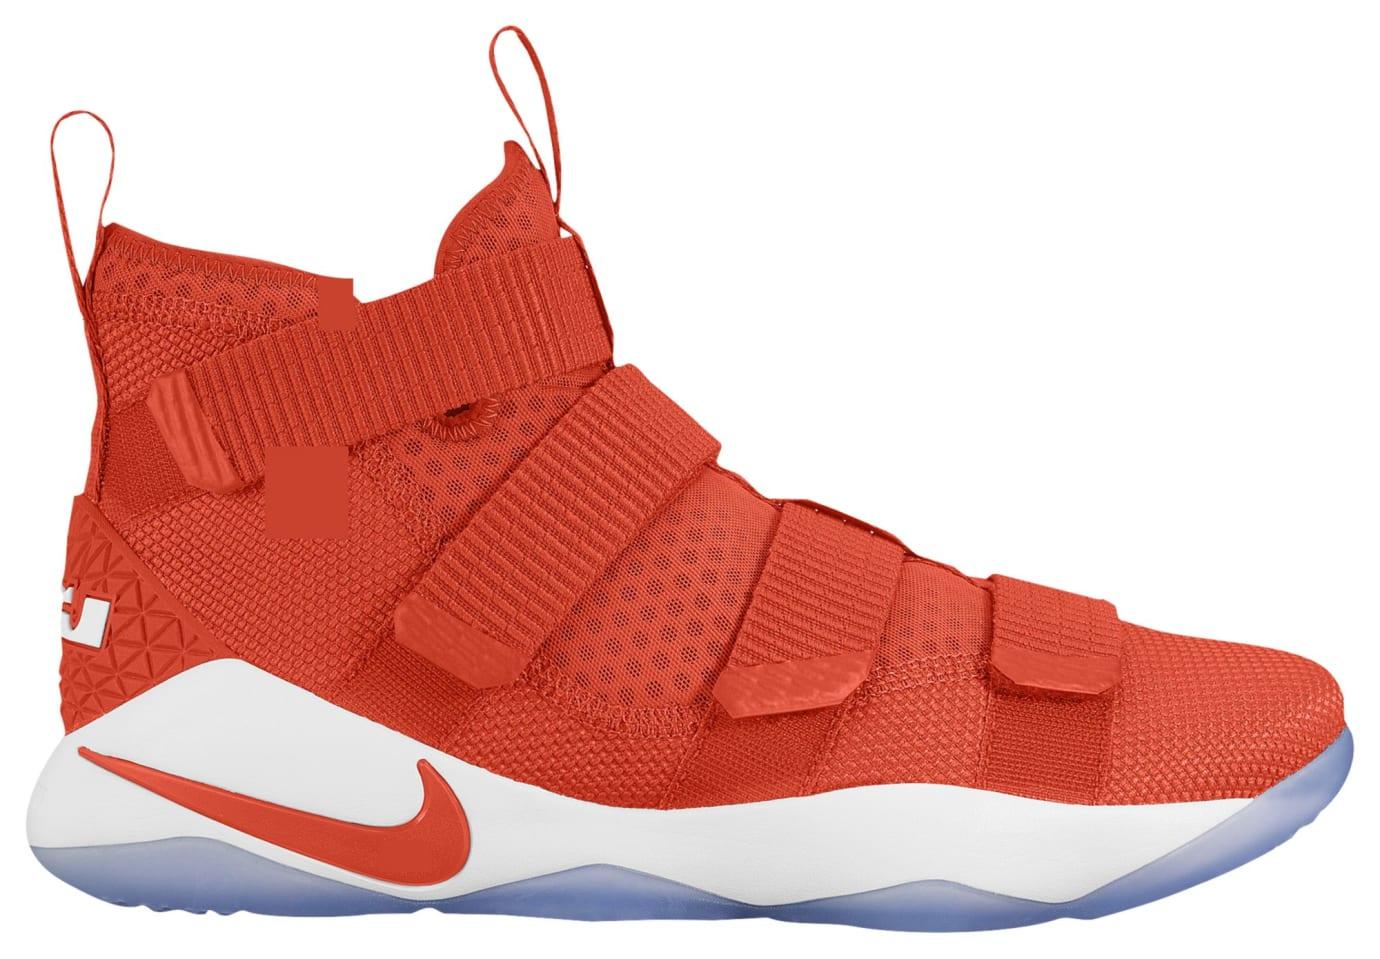 Nike LeBron Soldier 11 TB Orange